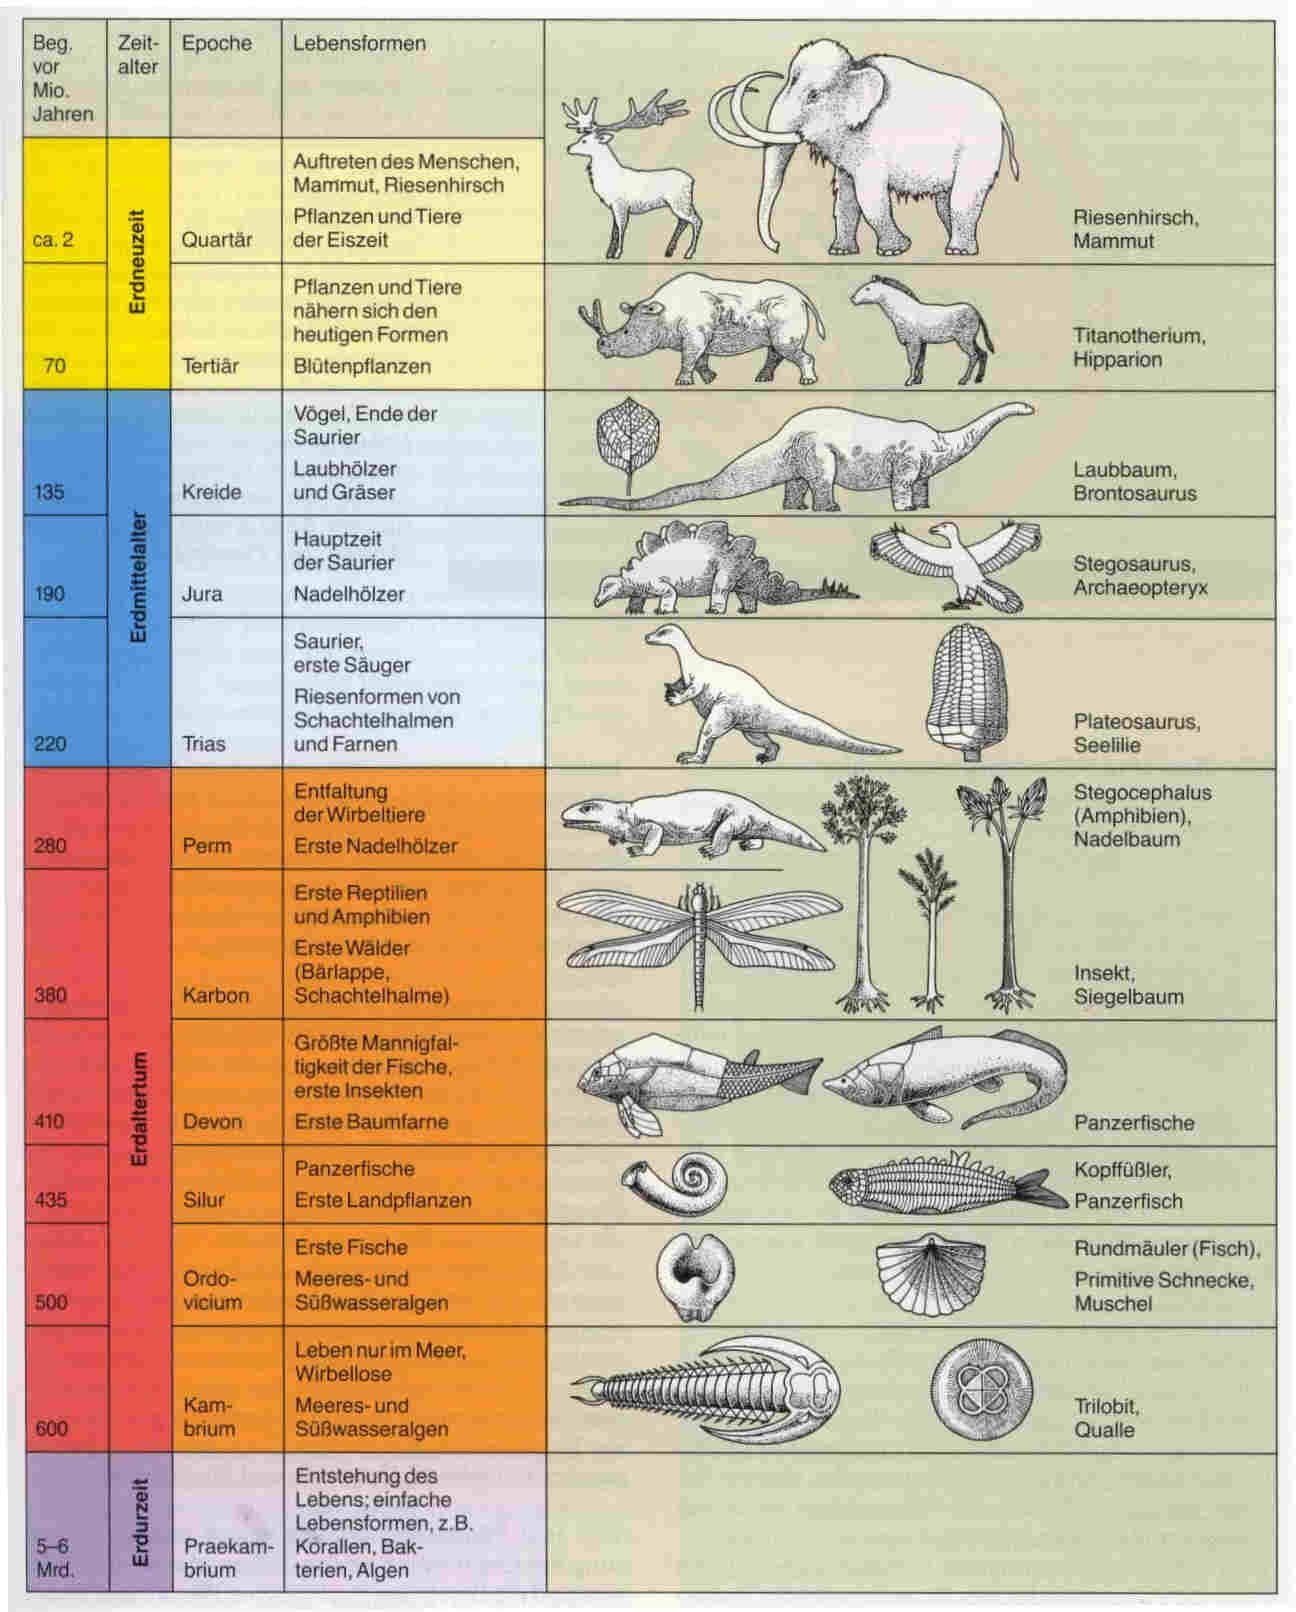 fossilien zeittafel google search kozmik earth biology und nature. Black Bedroom Furniture Sets. Home Design Ideas